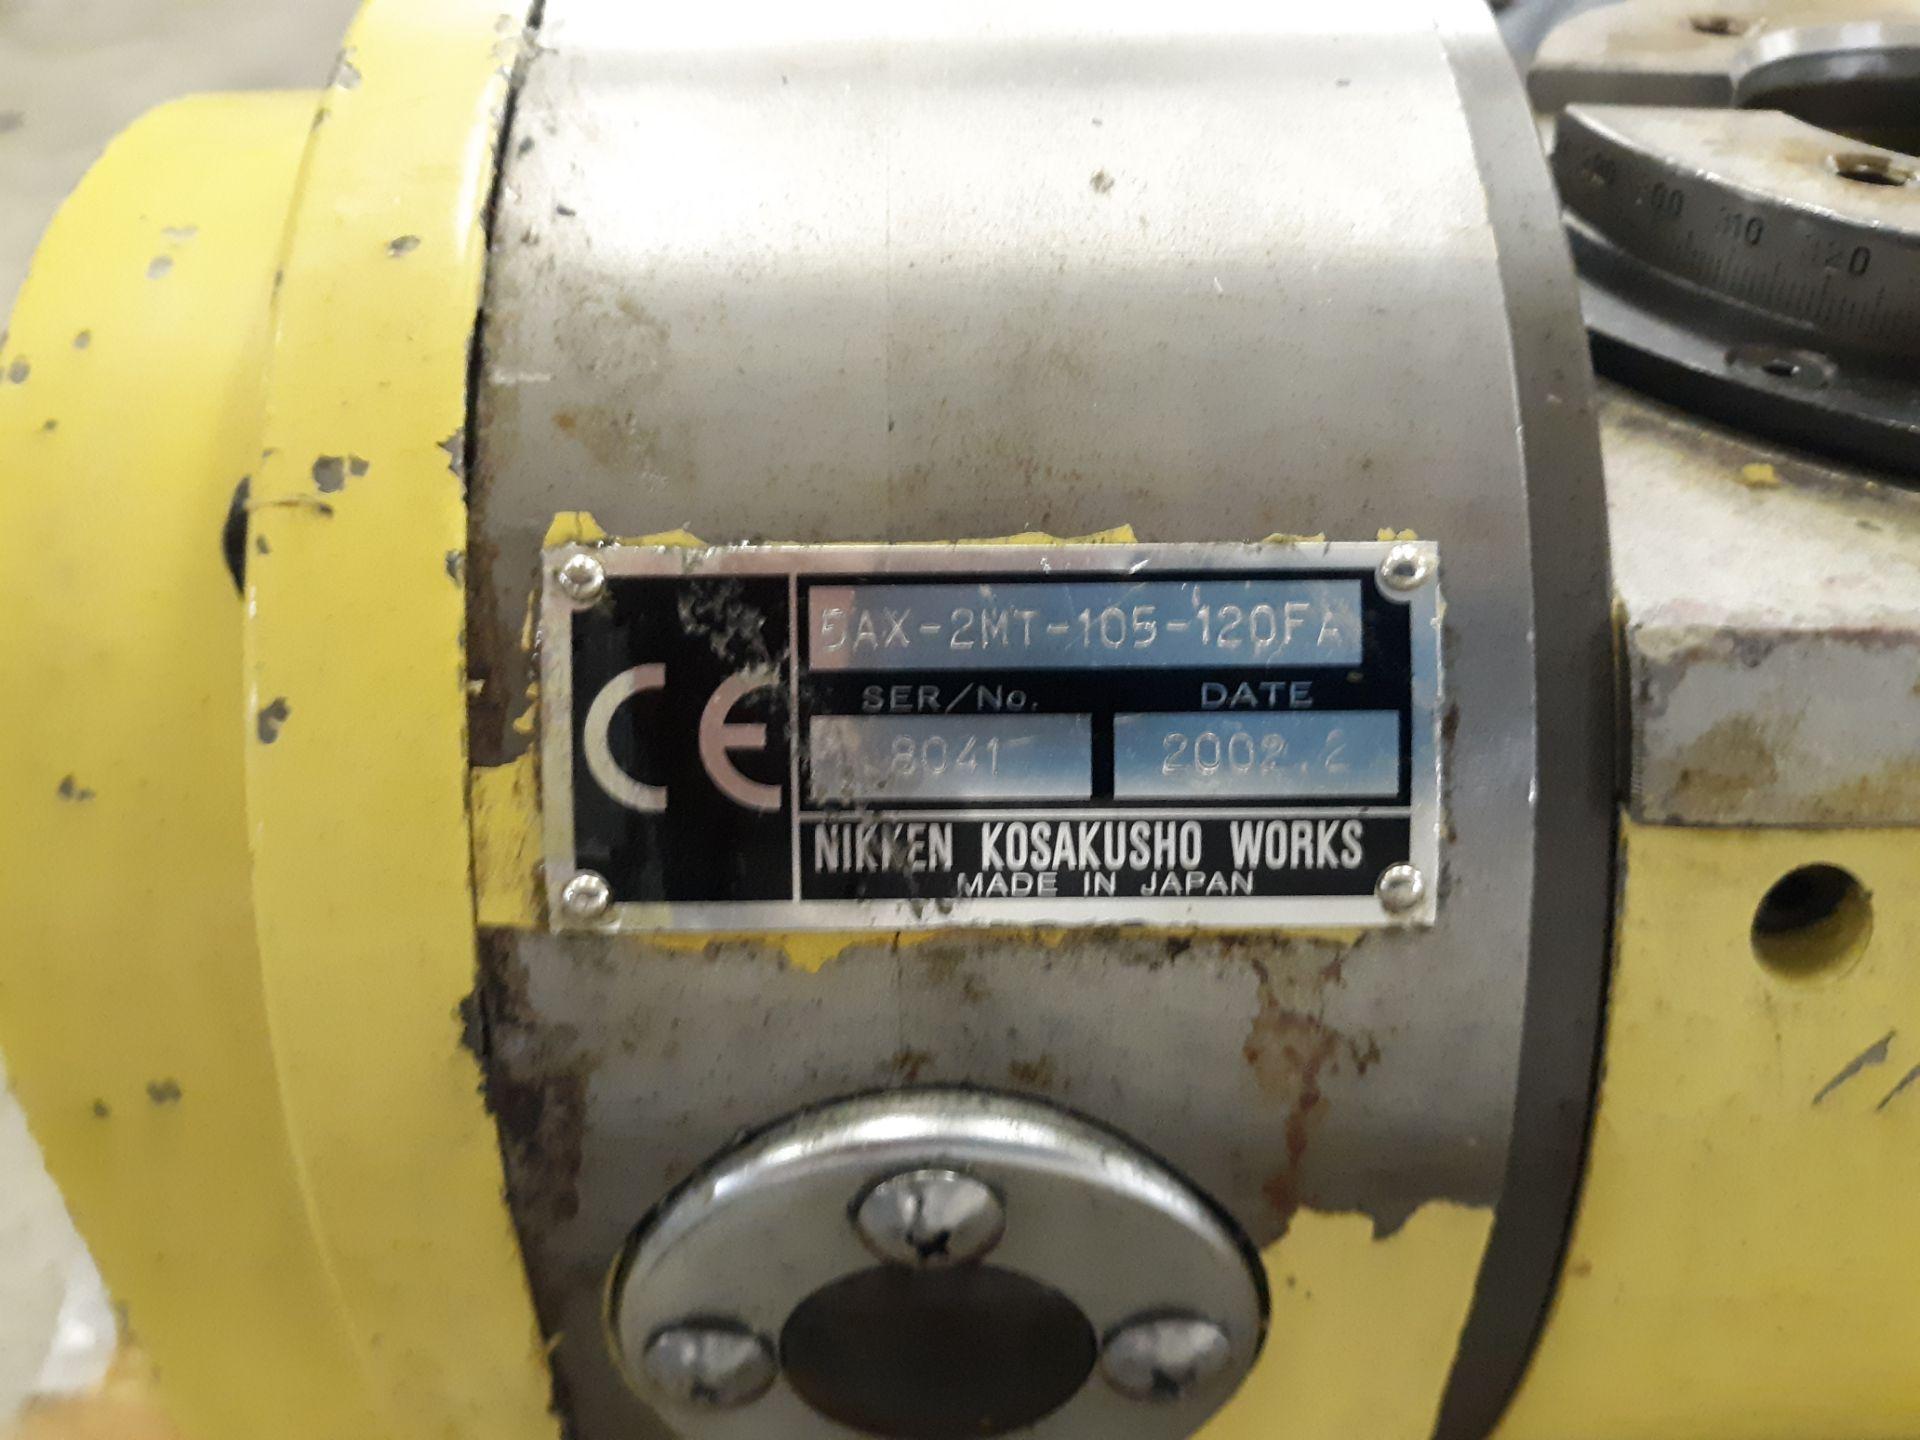 Lot 37 - NIKKEN KOSAKUSHO WORKS ROTARY TABLE W/ CABLES(2) NEC CONTROL (2)NIKKEN KEYPADS RIGGING FEE:$10